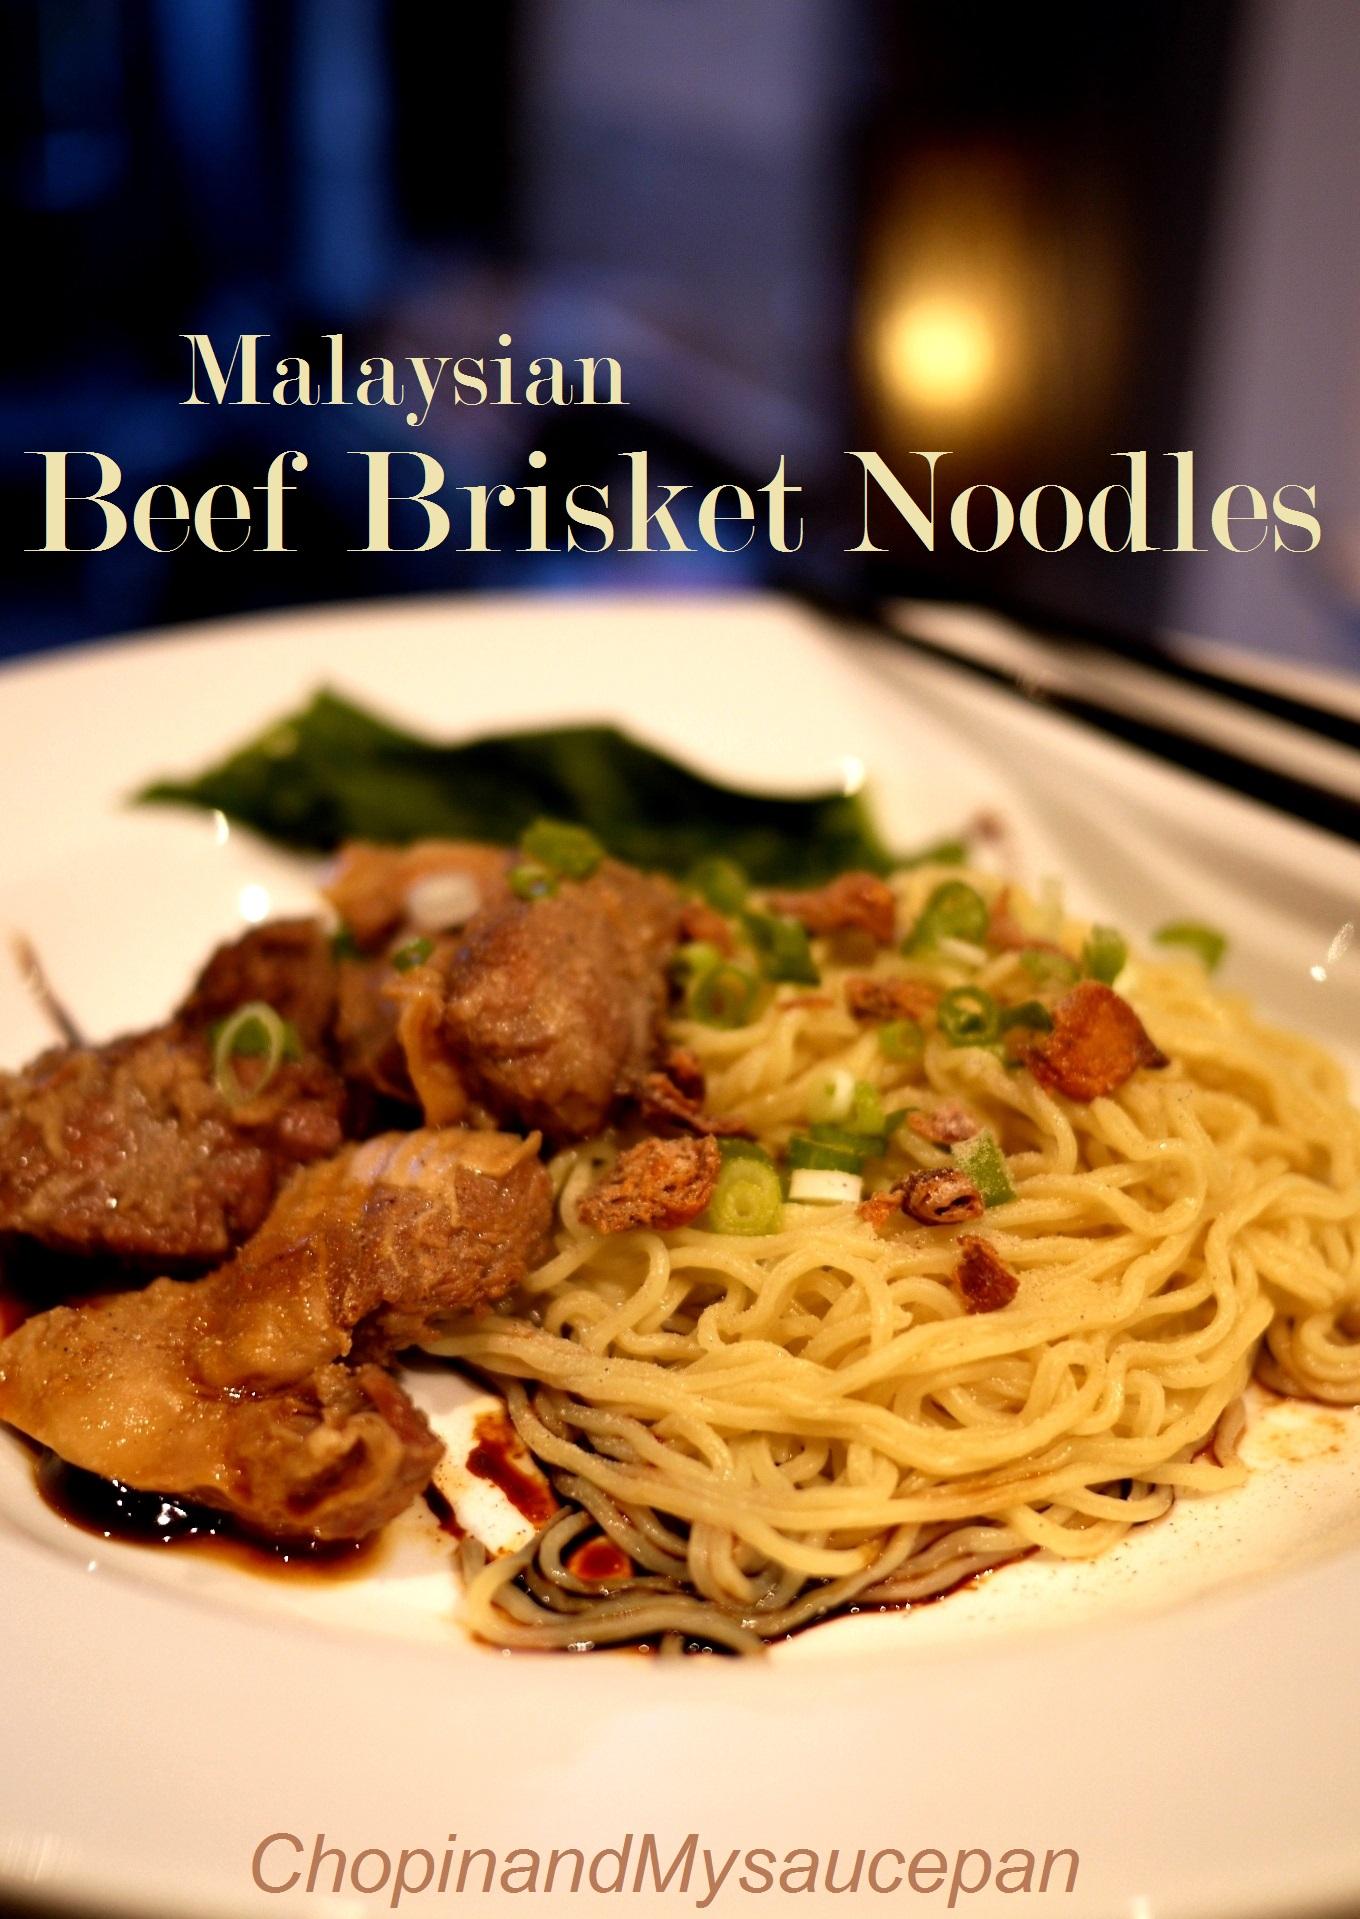 Malaysian beef brisket noodles